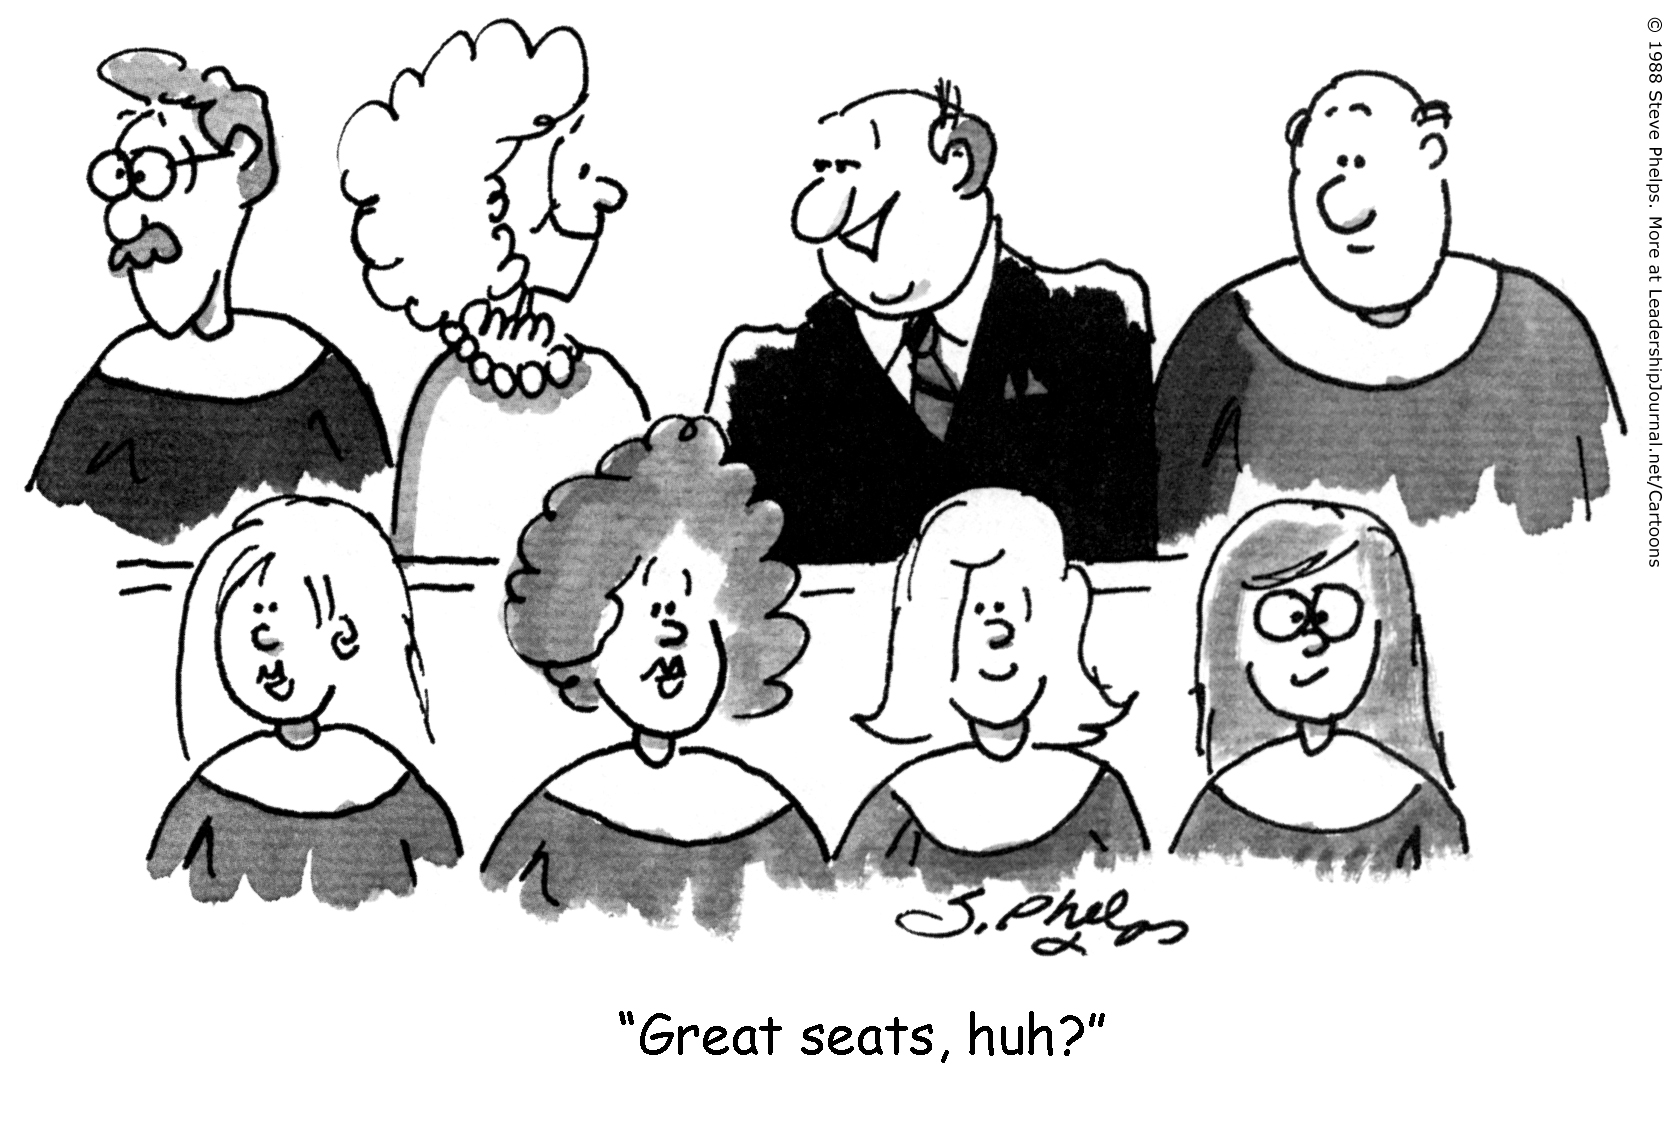 accidental choir members preaching today